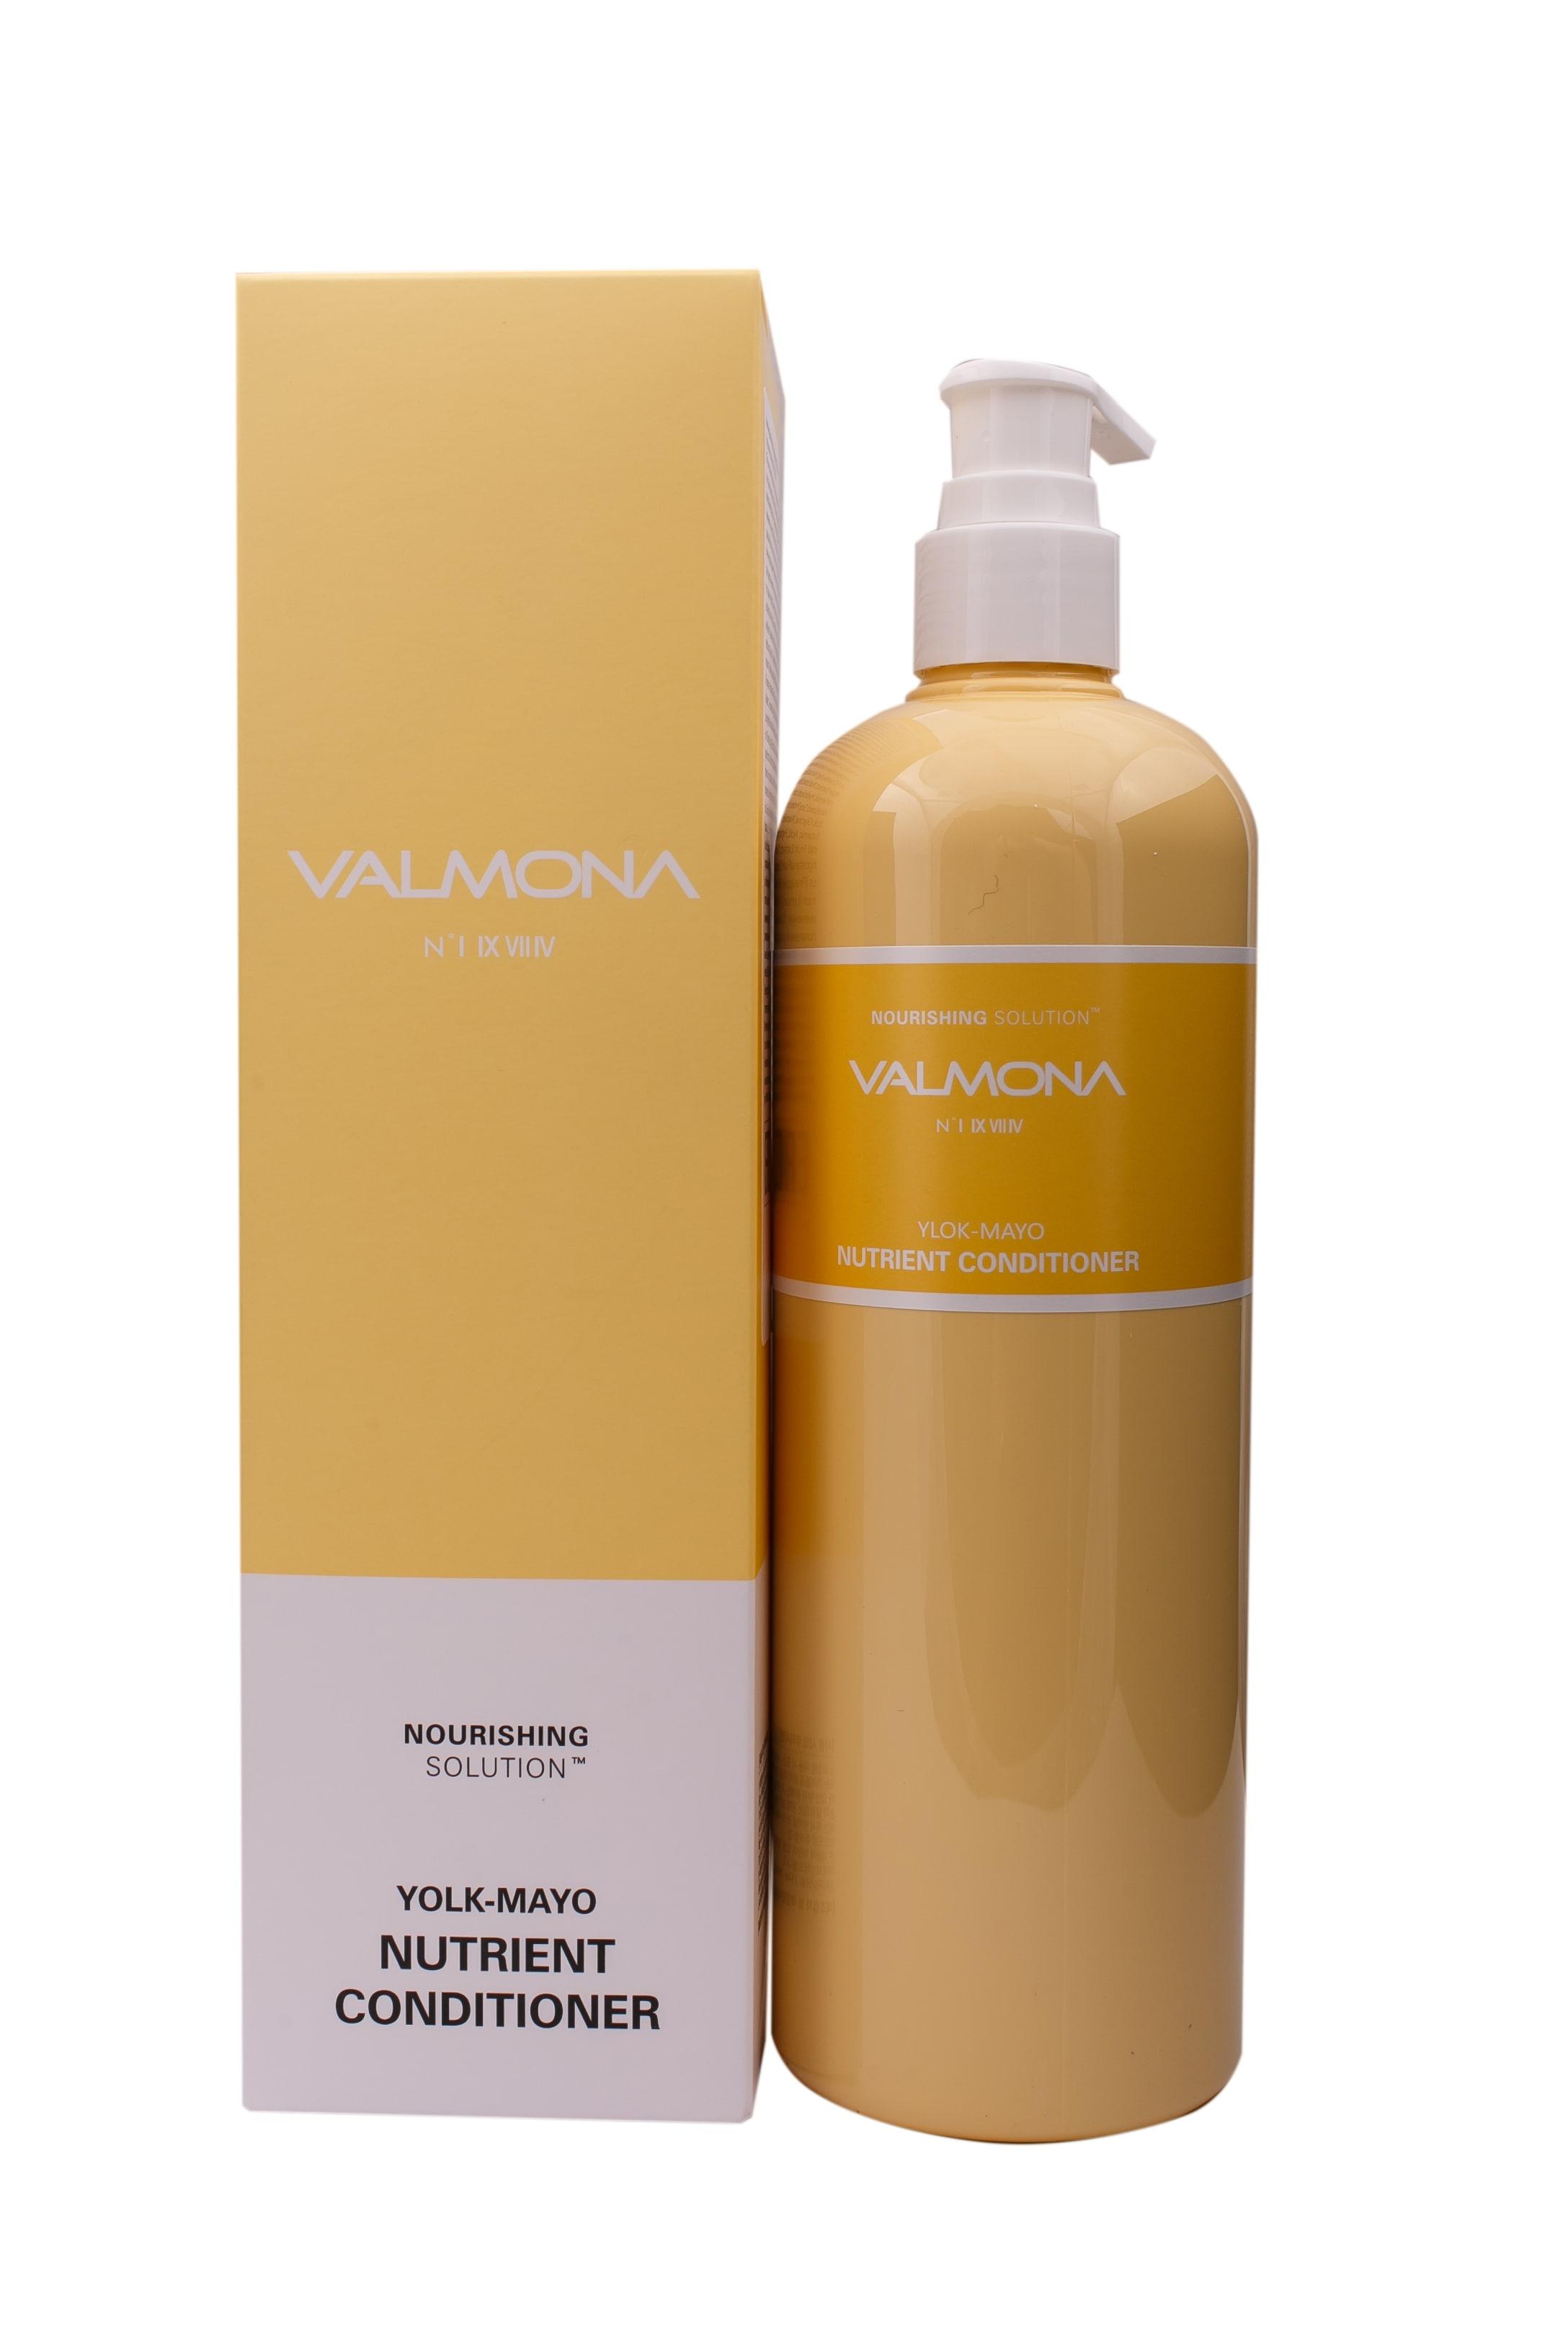 Питательный кондиционер с яичным желтком Valmona Nourishing Solution Yolk-Mayo Nutrient Conditioner, 480 мл